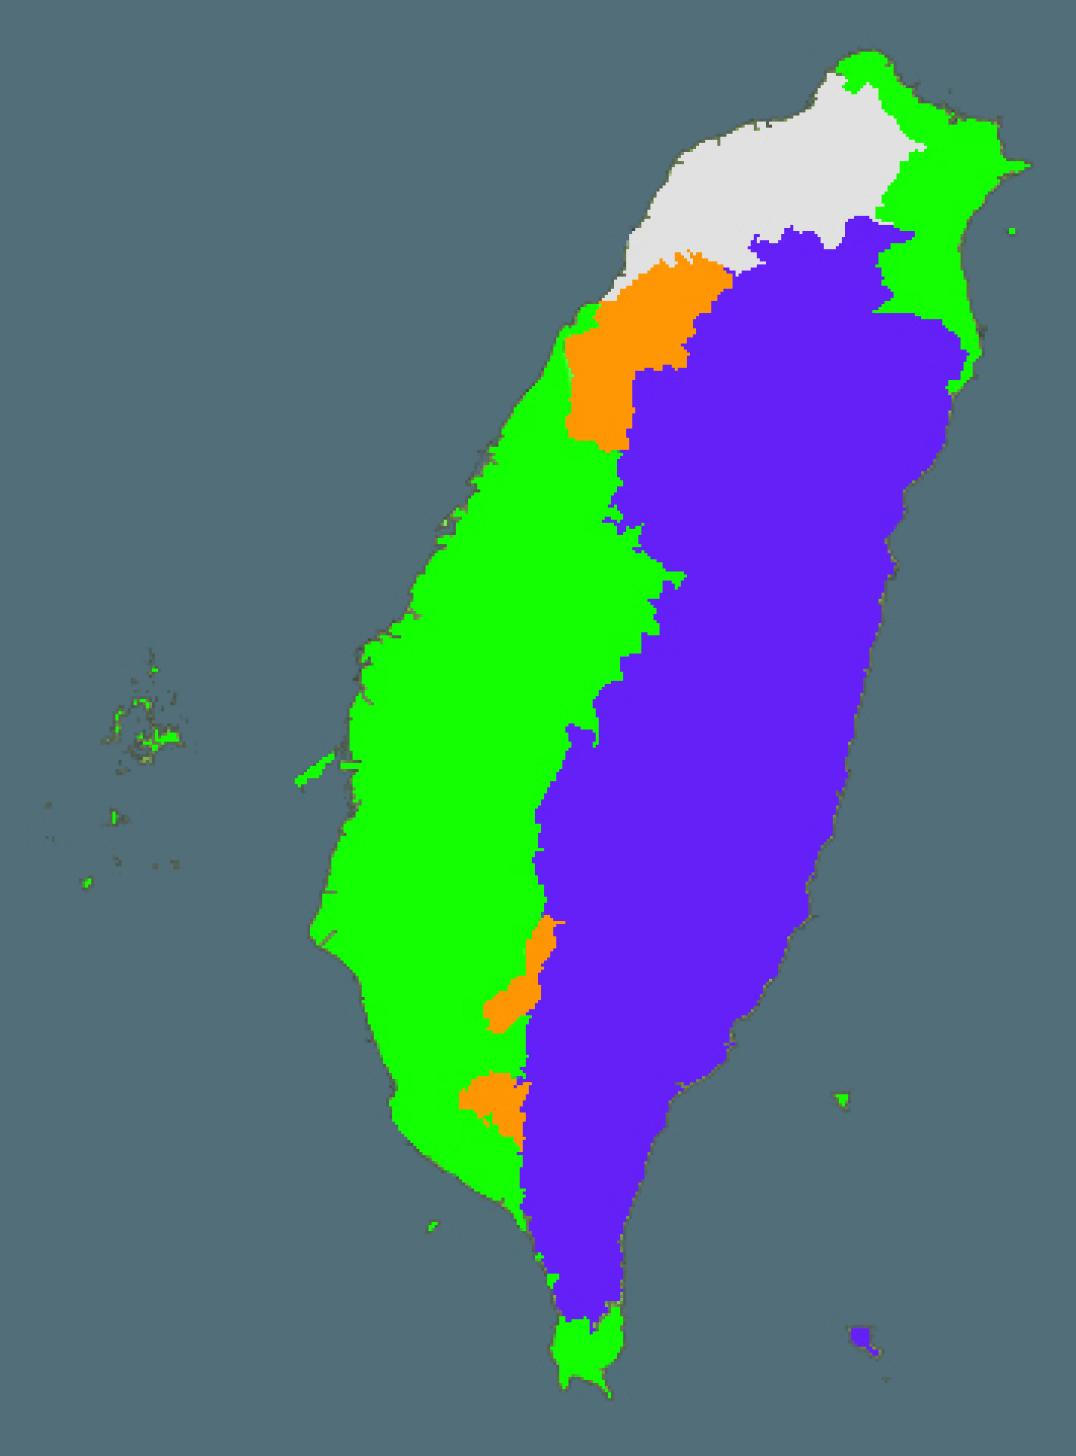 Taiwan's language usage by geography